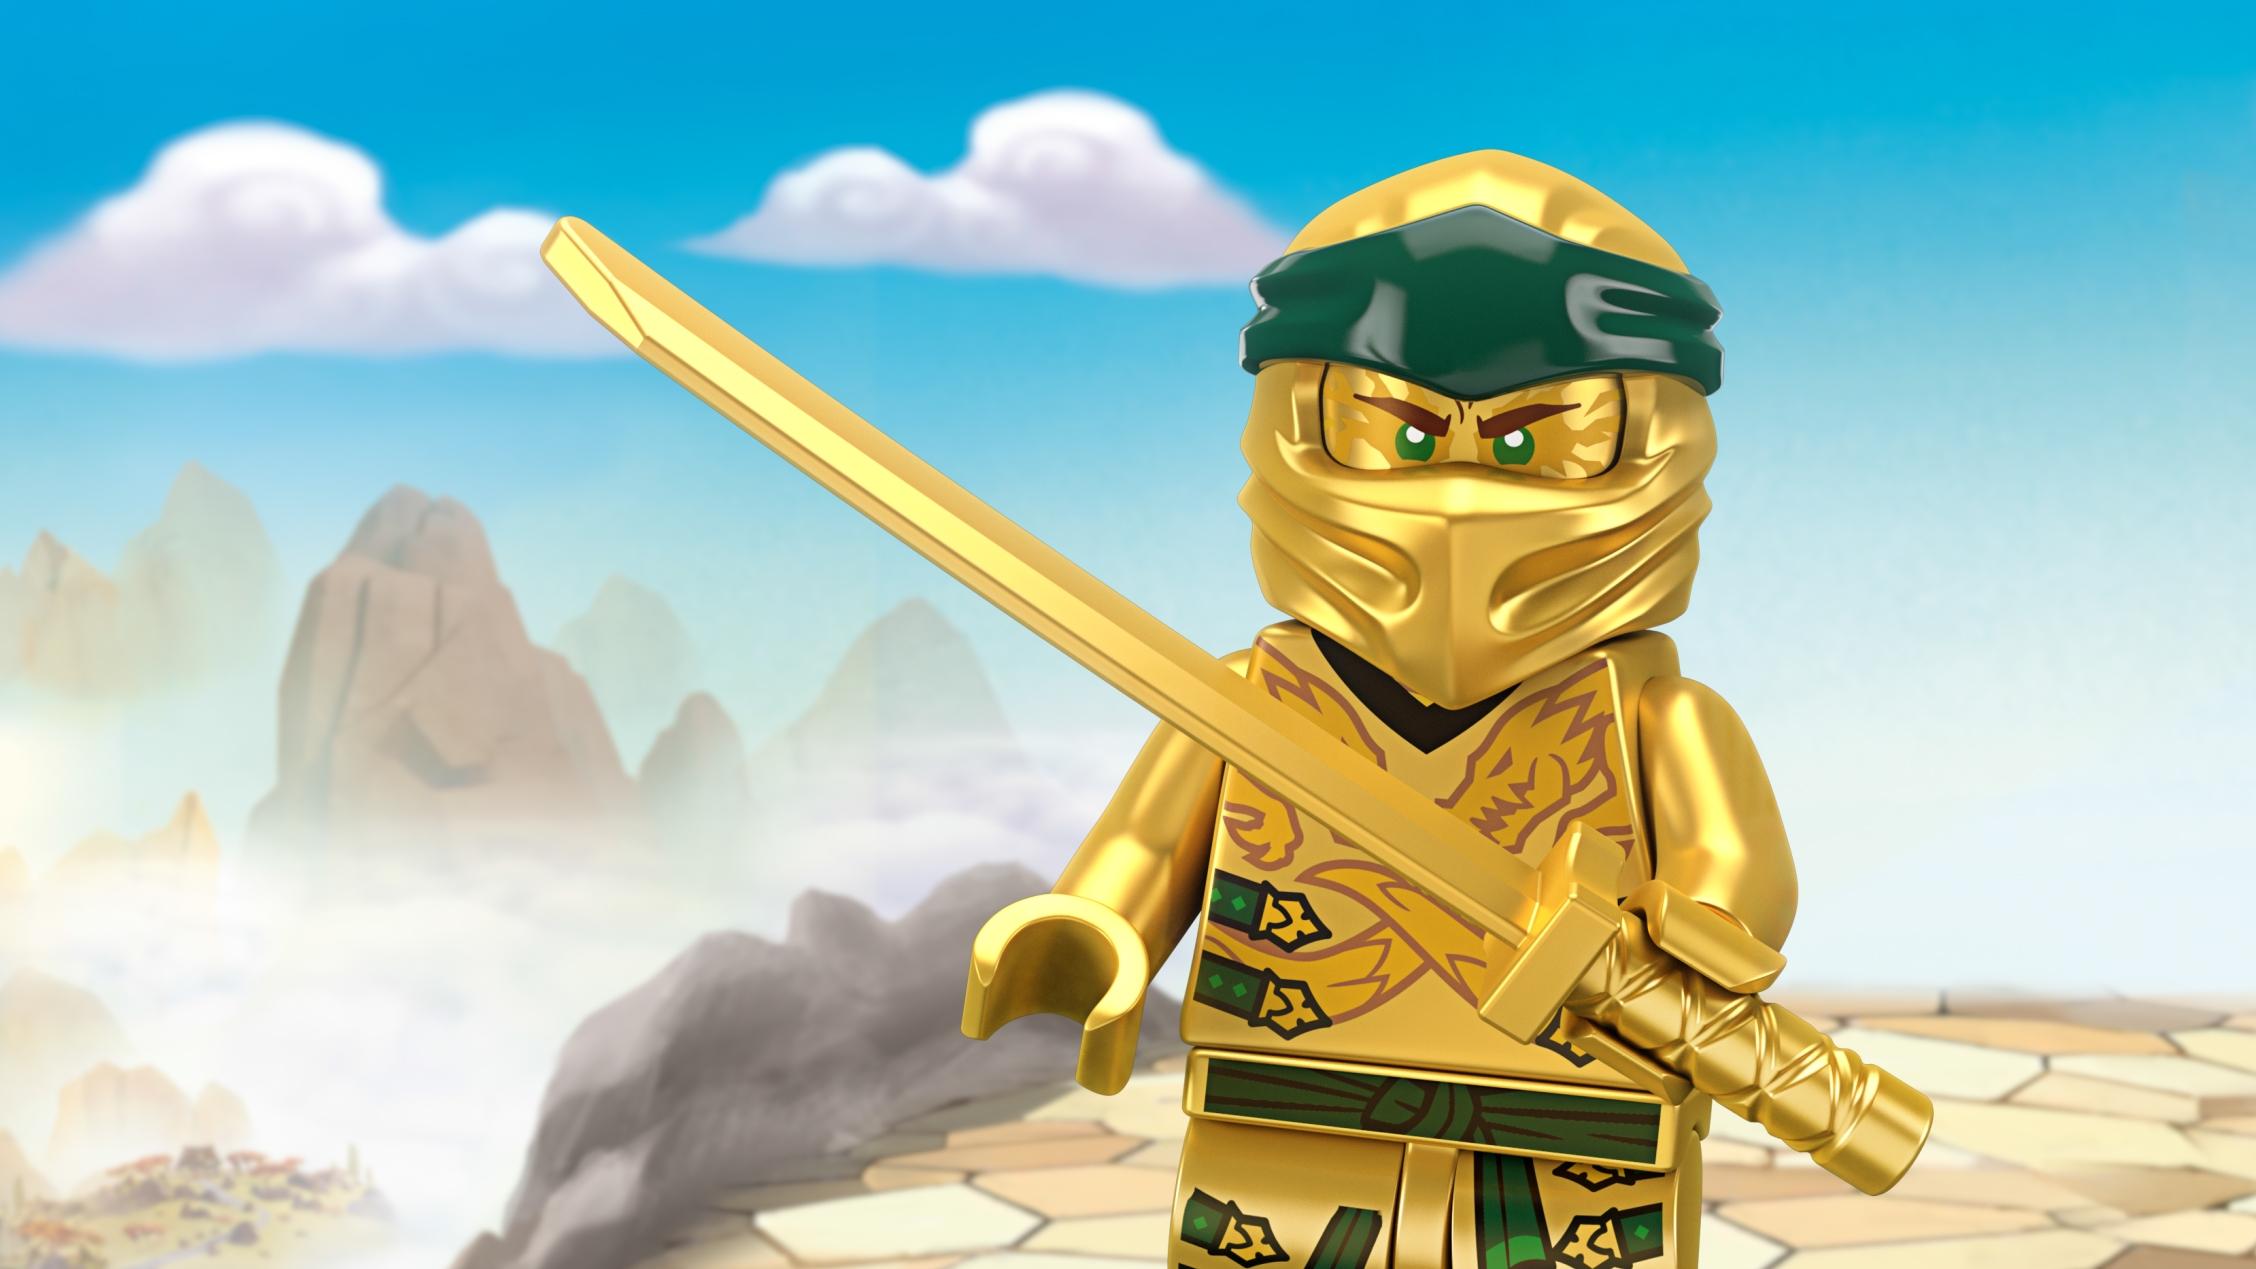 Golden Ninja Lloyd Lego Ninjago Characters Lego Com For Kids Au